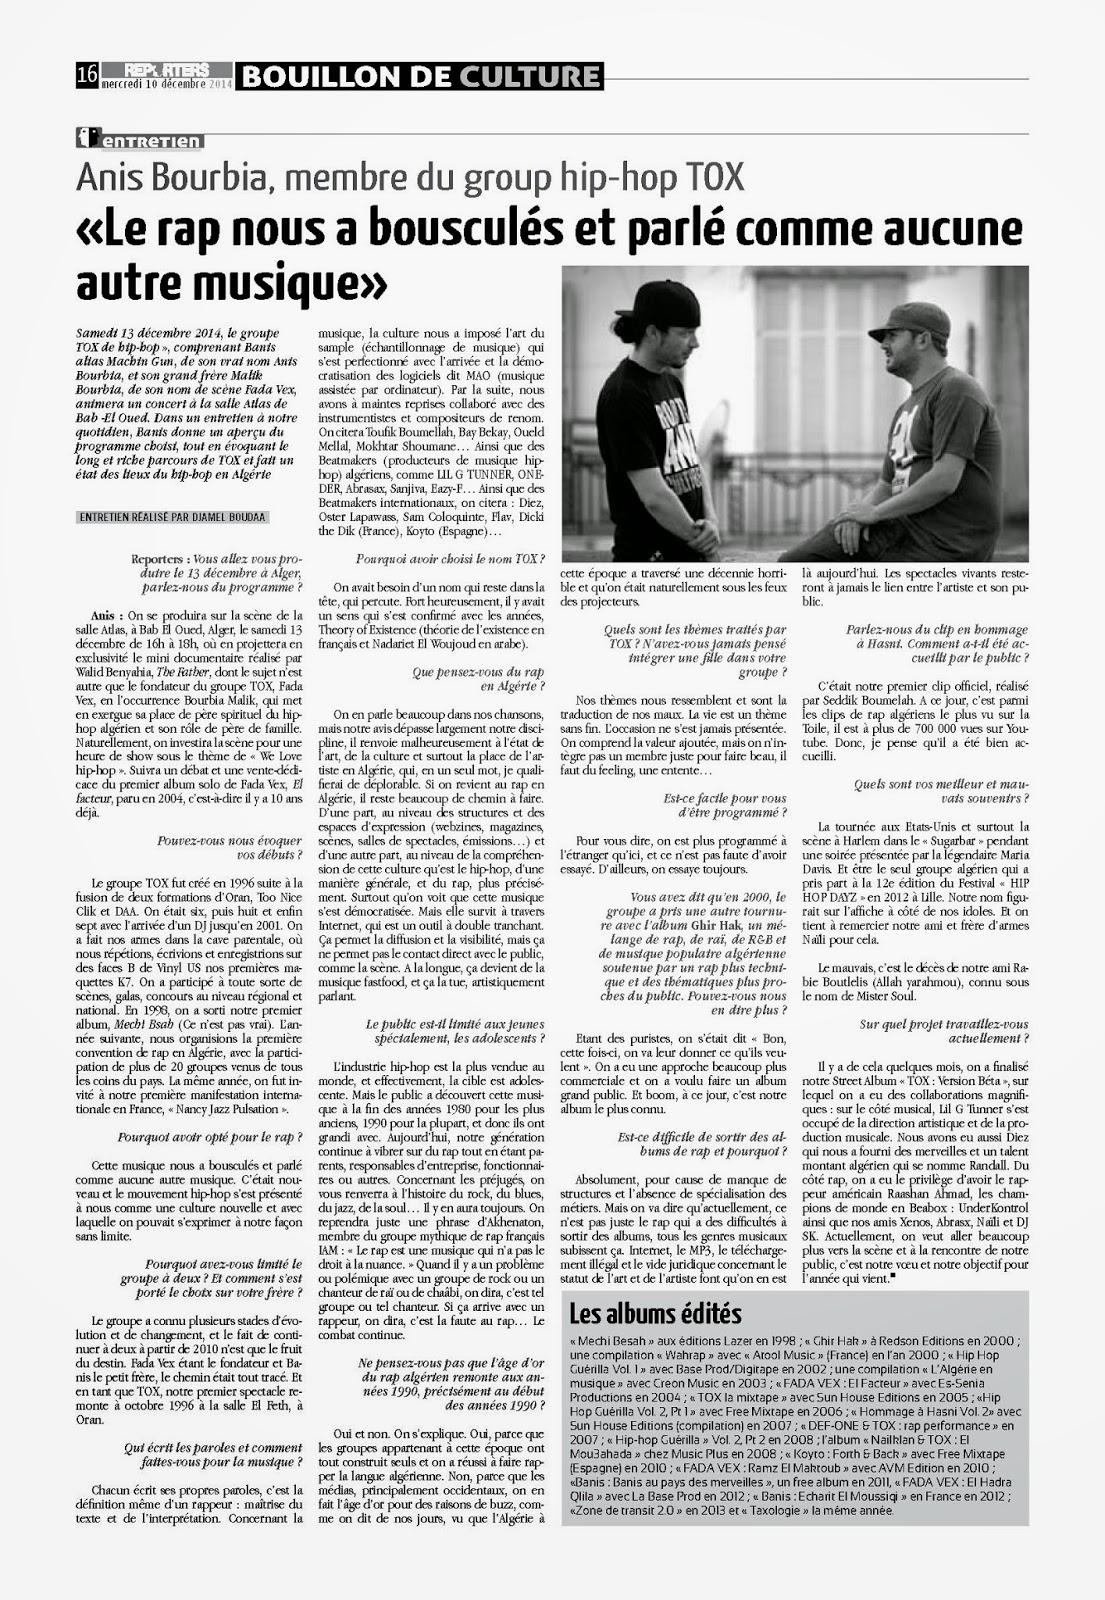 REPORTERS RAp Algerien TOX